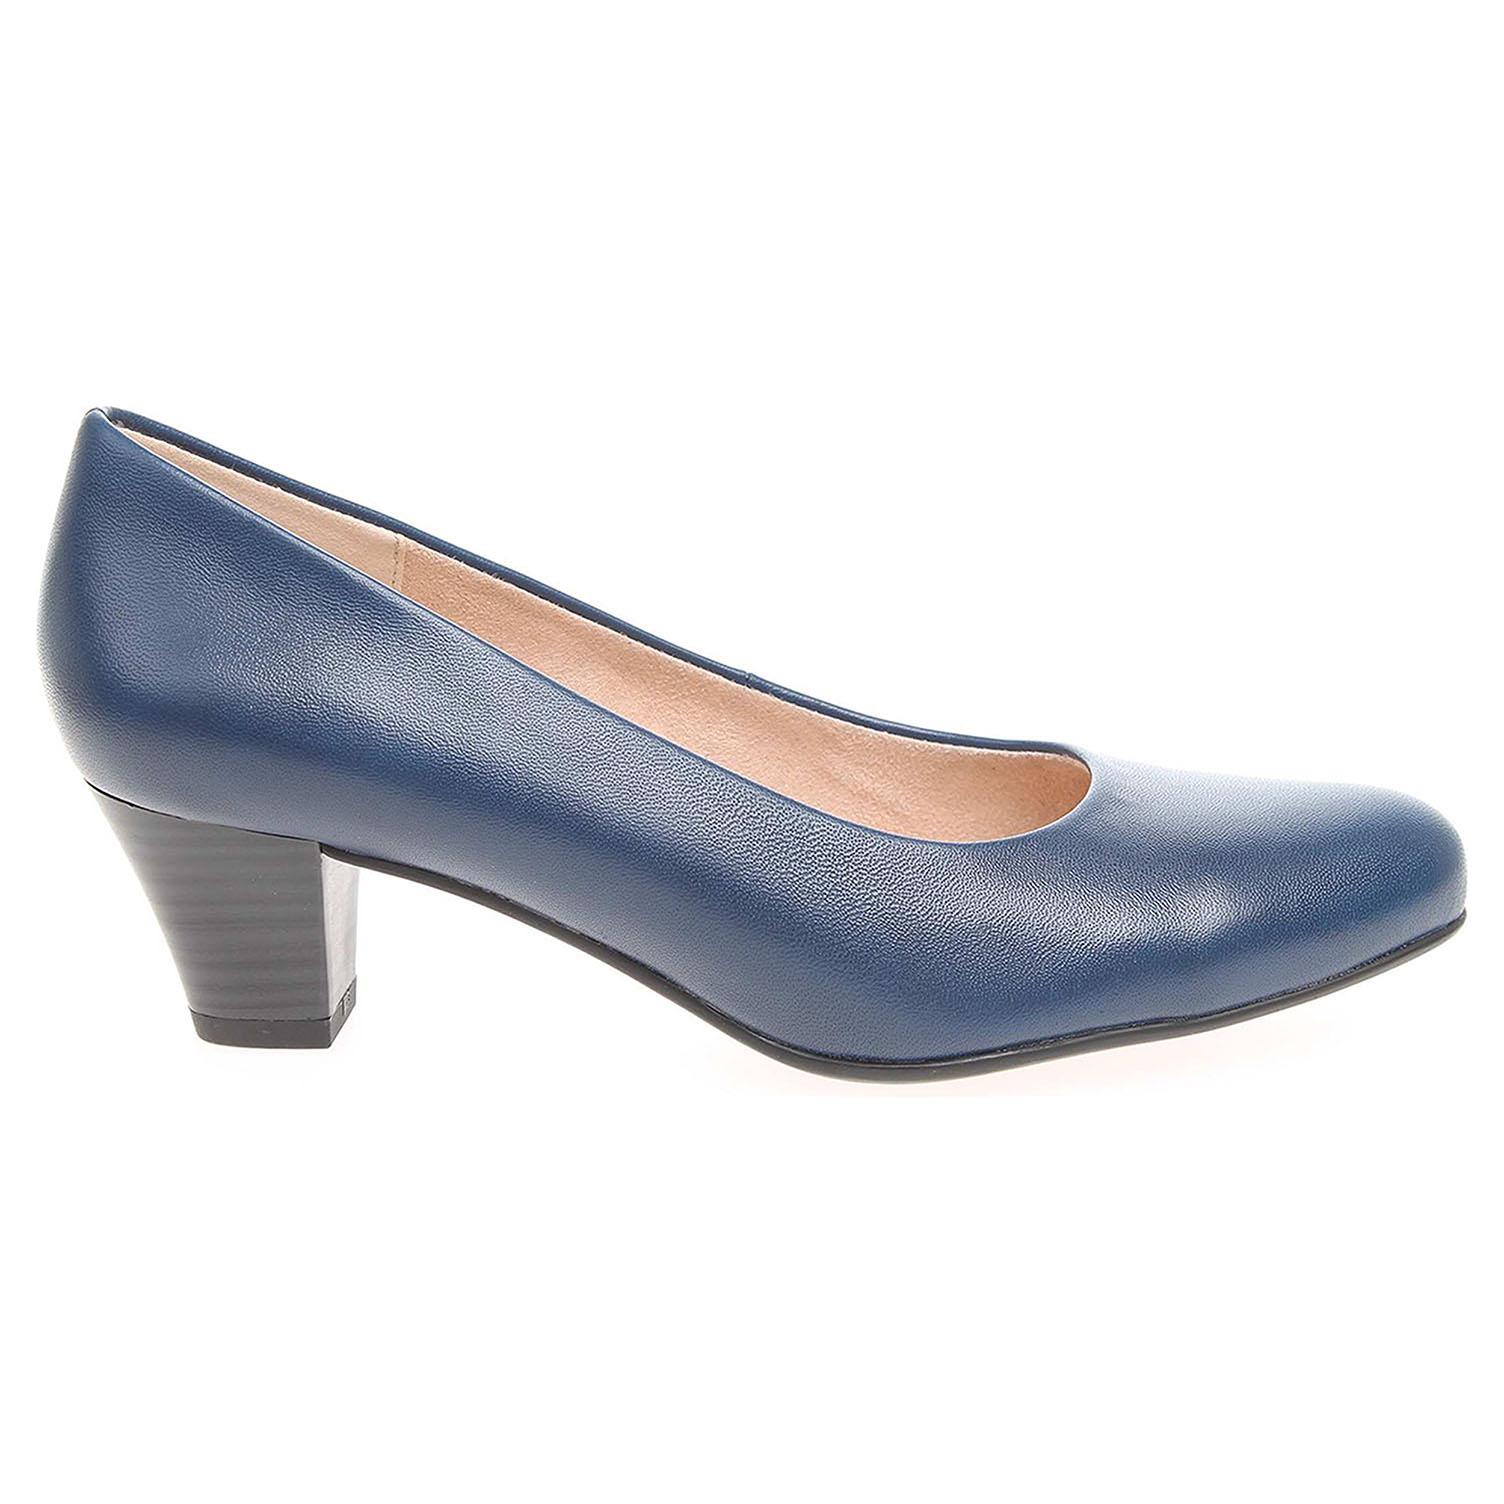 Ecco Caprice dámské lodičky 9-22306-28 modré 22901233 76c2bdad3a